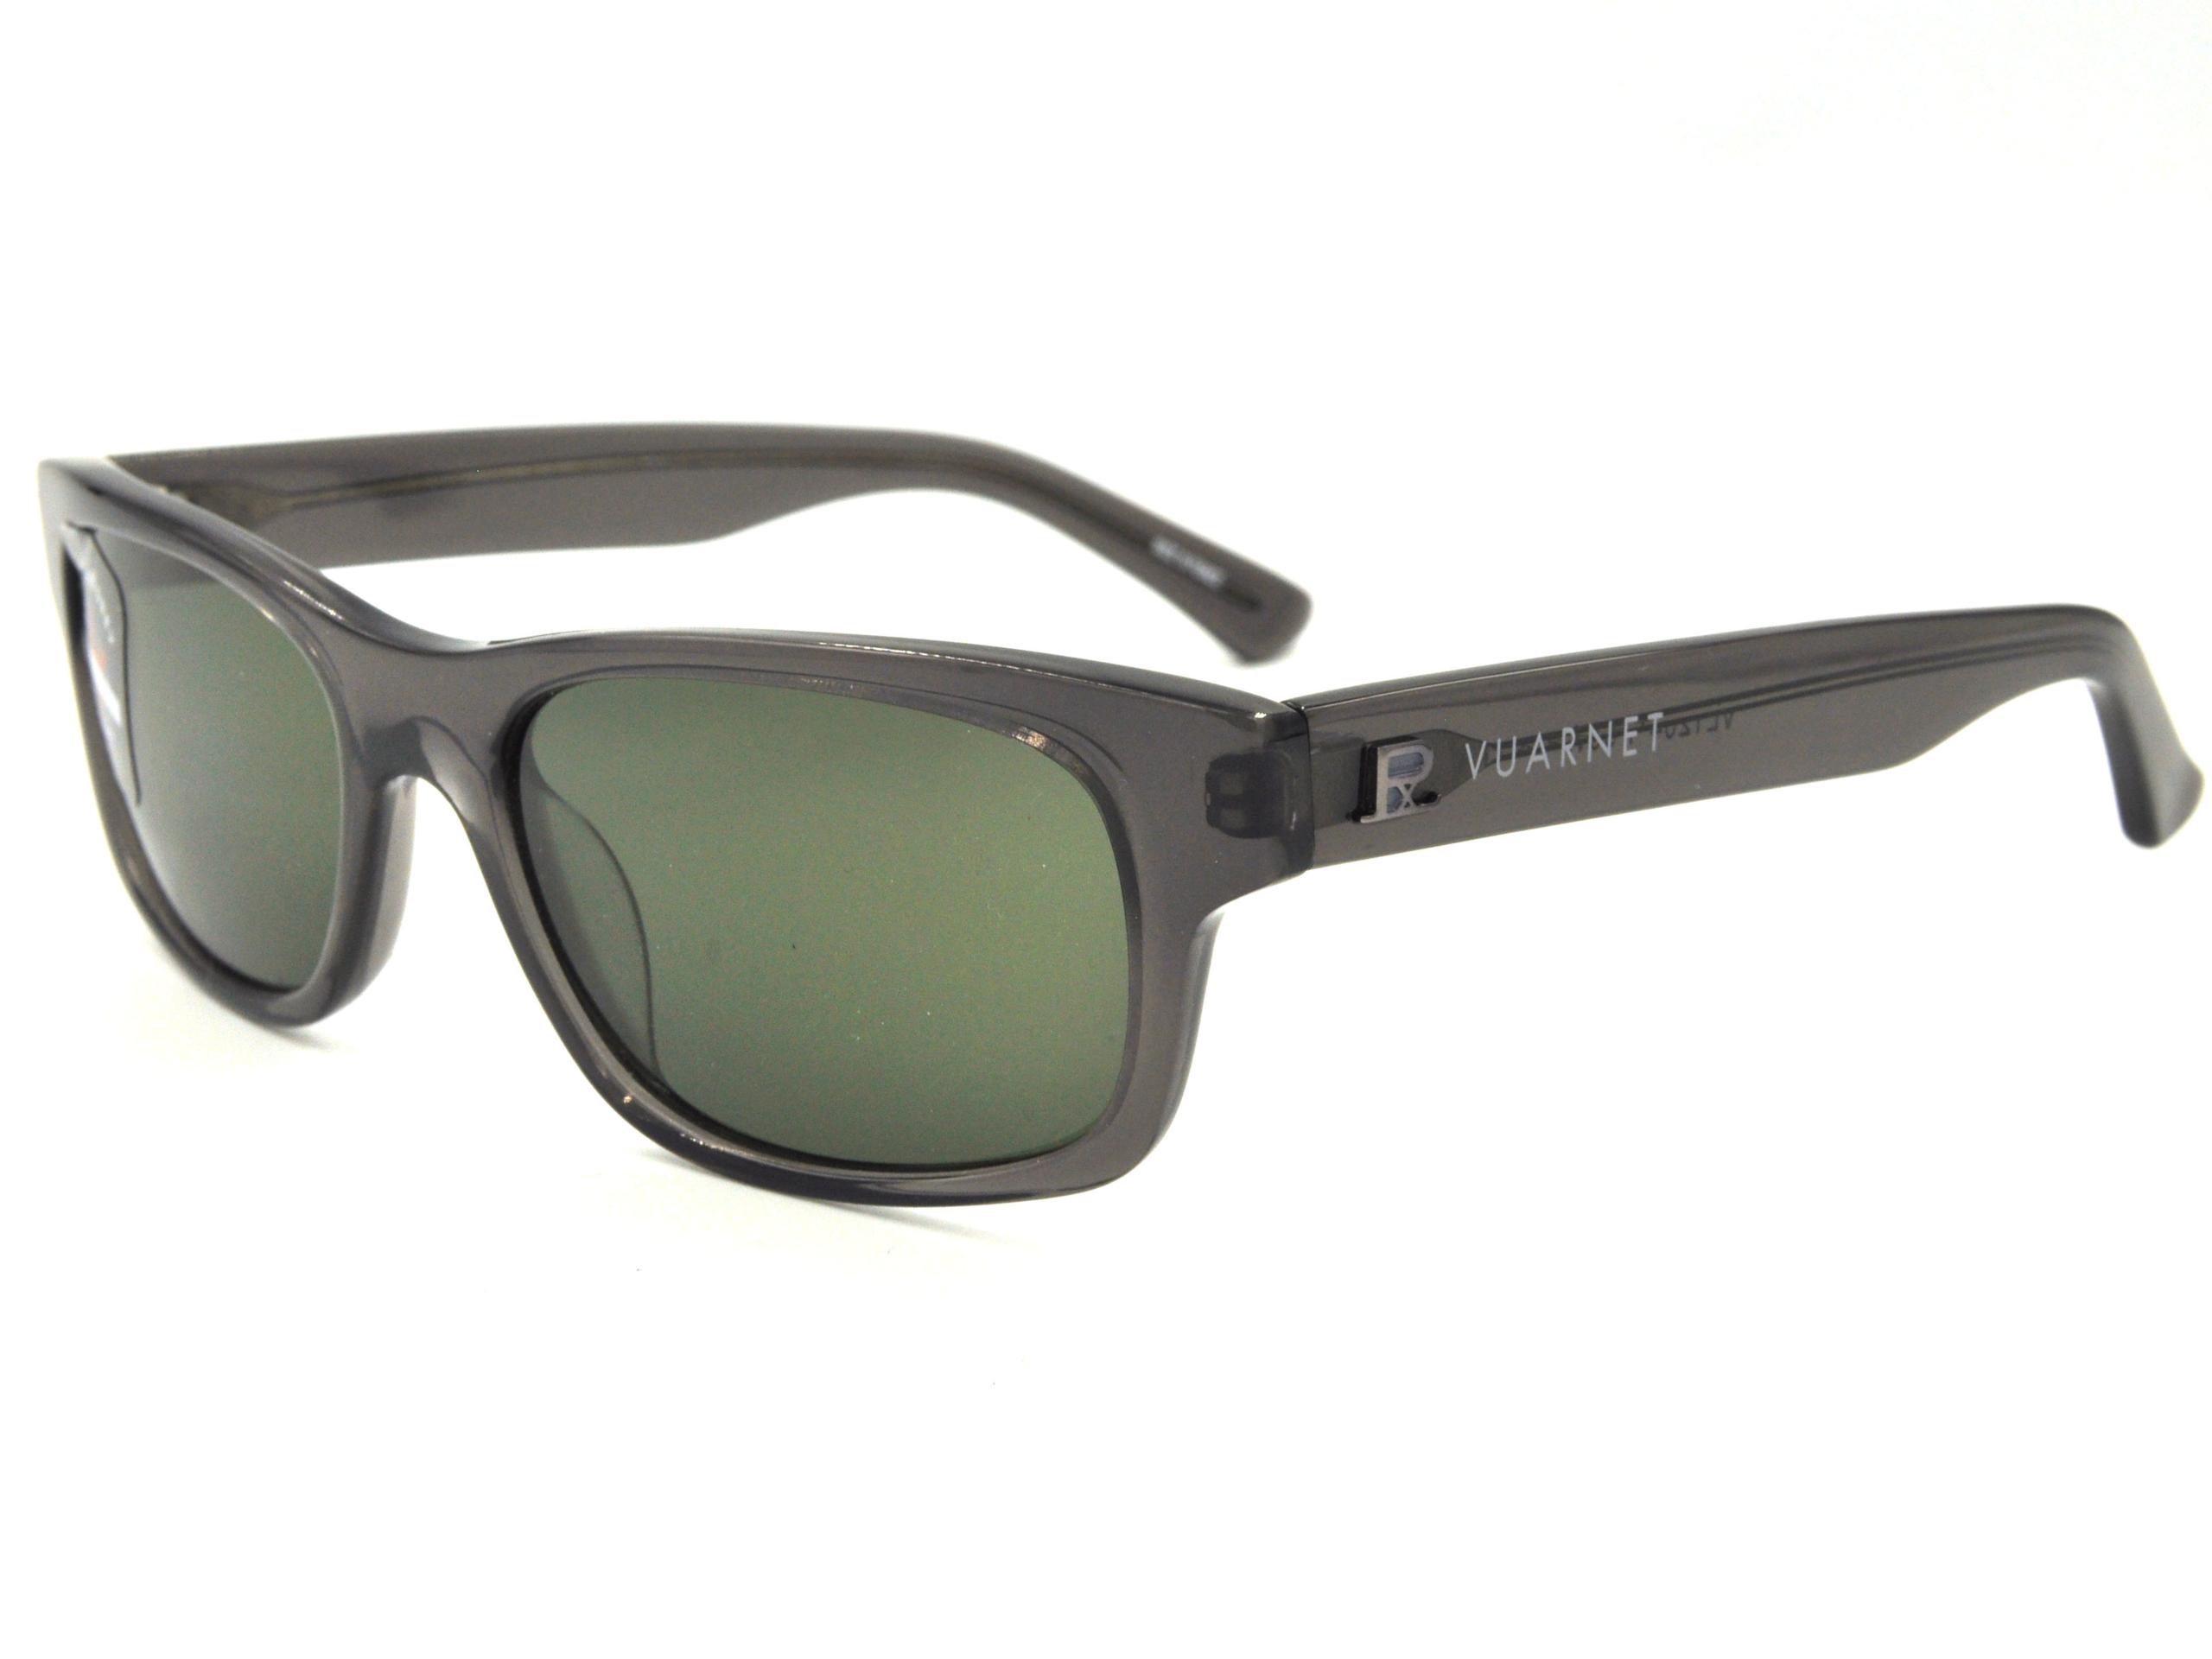 VUARNET VL1204 P00W Sunglasses 2020